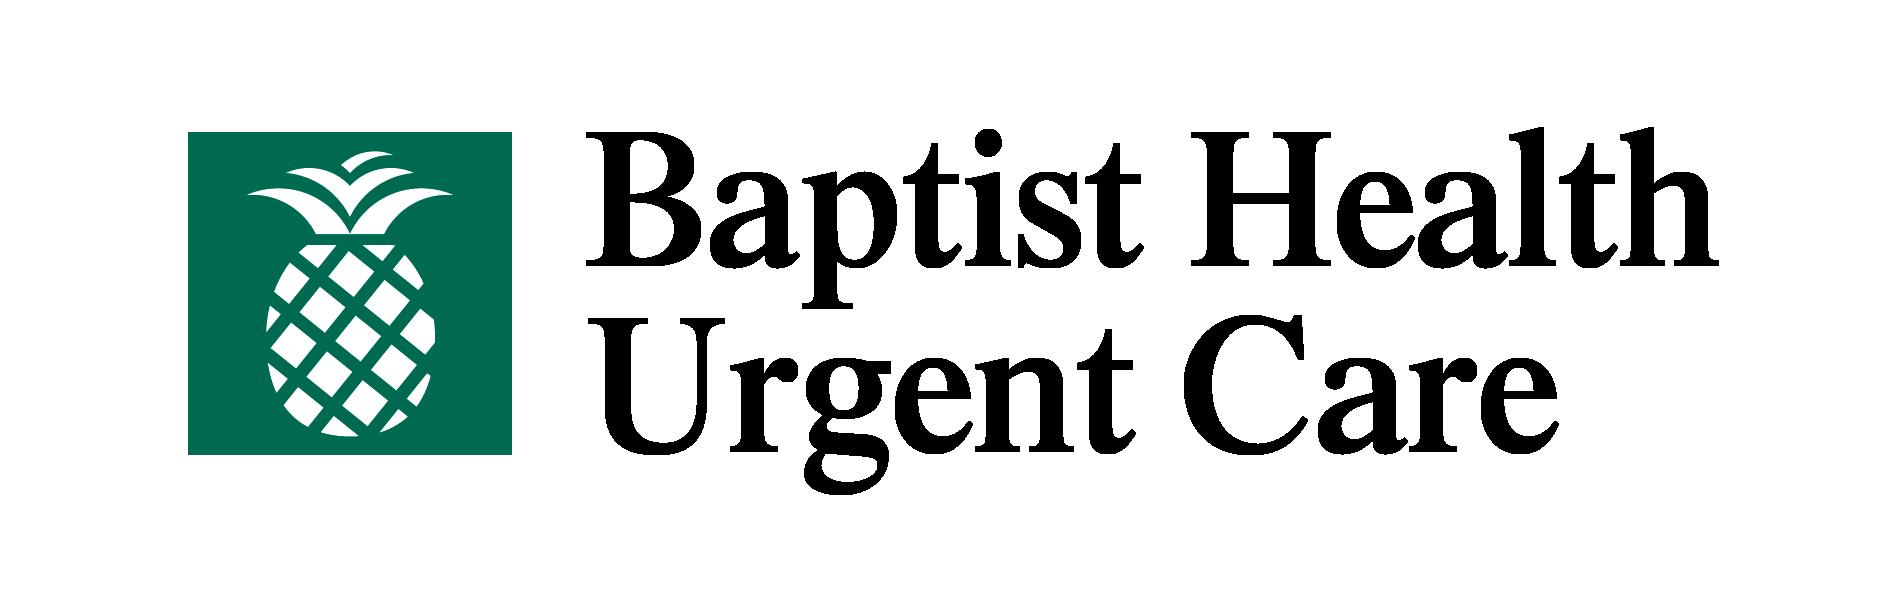 Baptist Health Urgent Care - West Boca Raton Logo